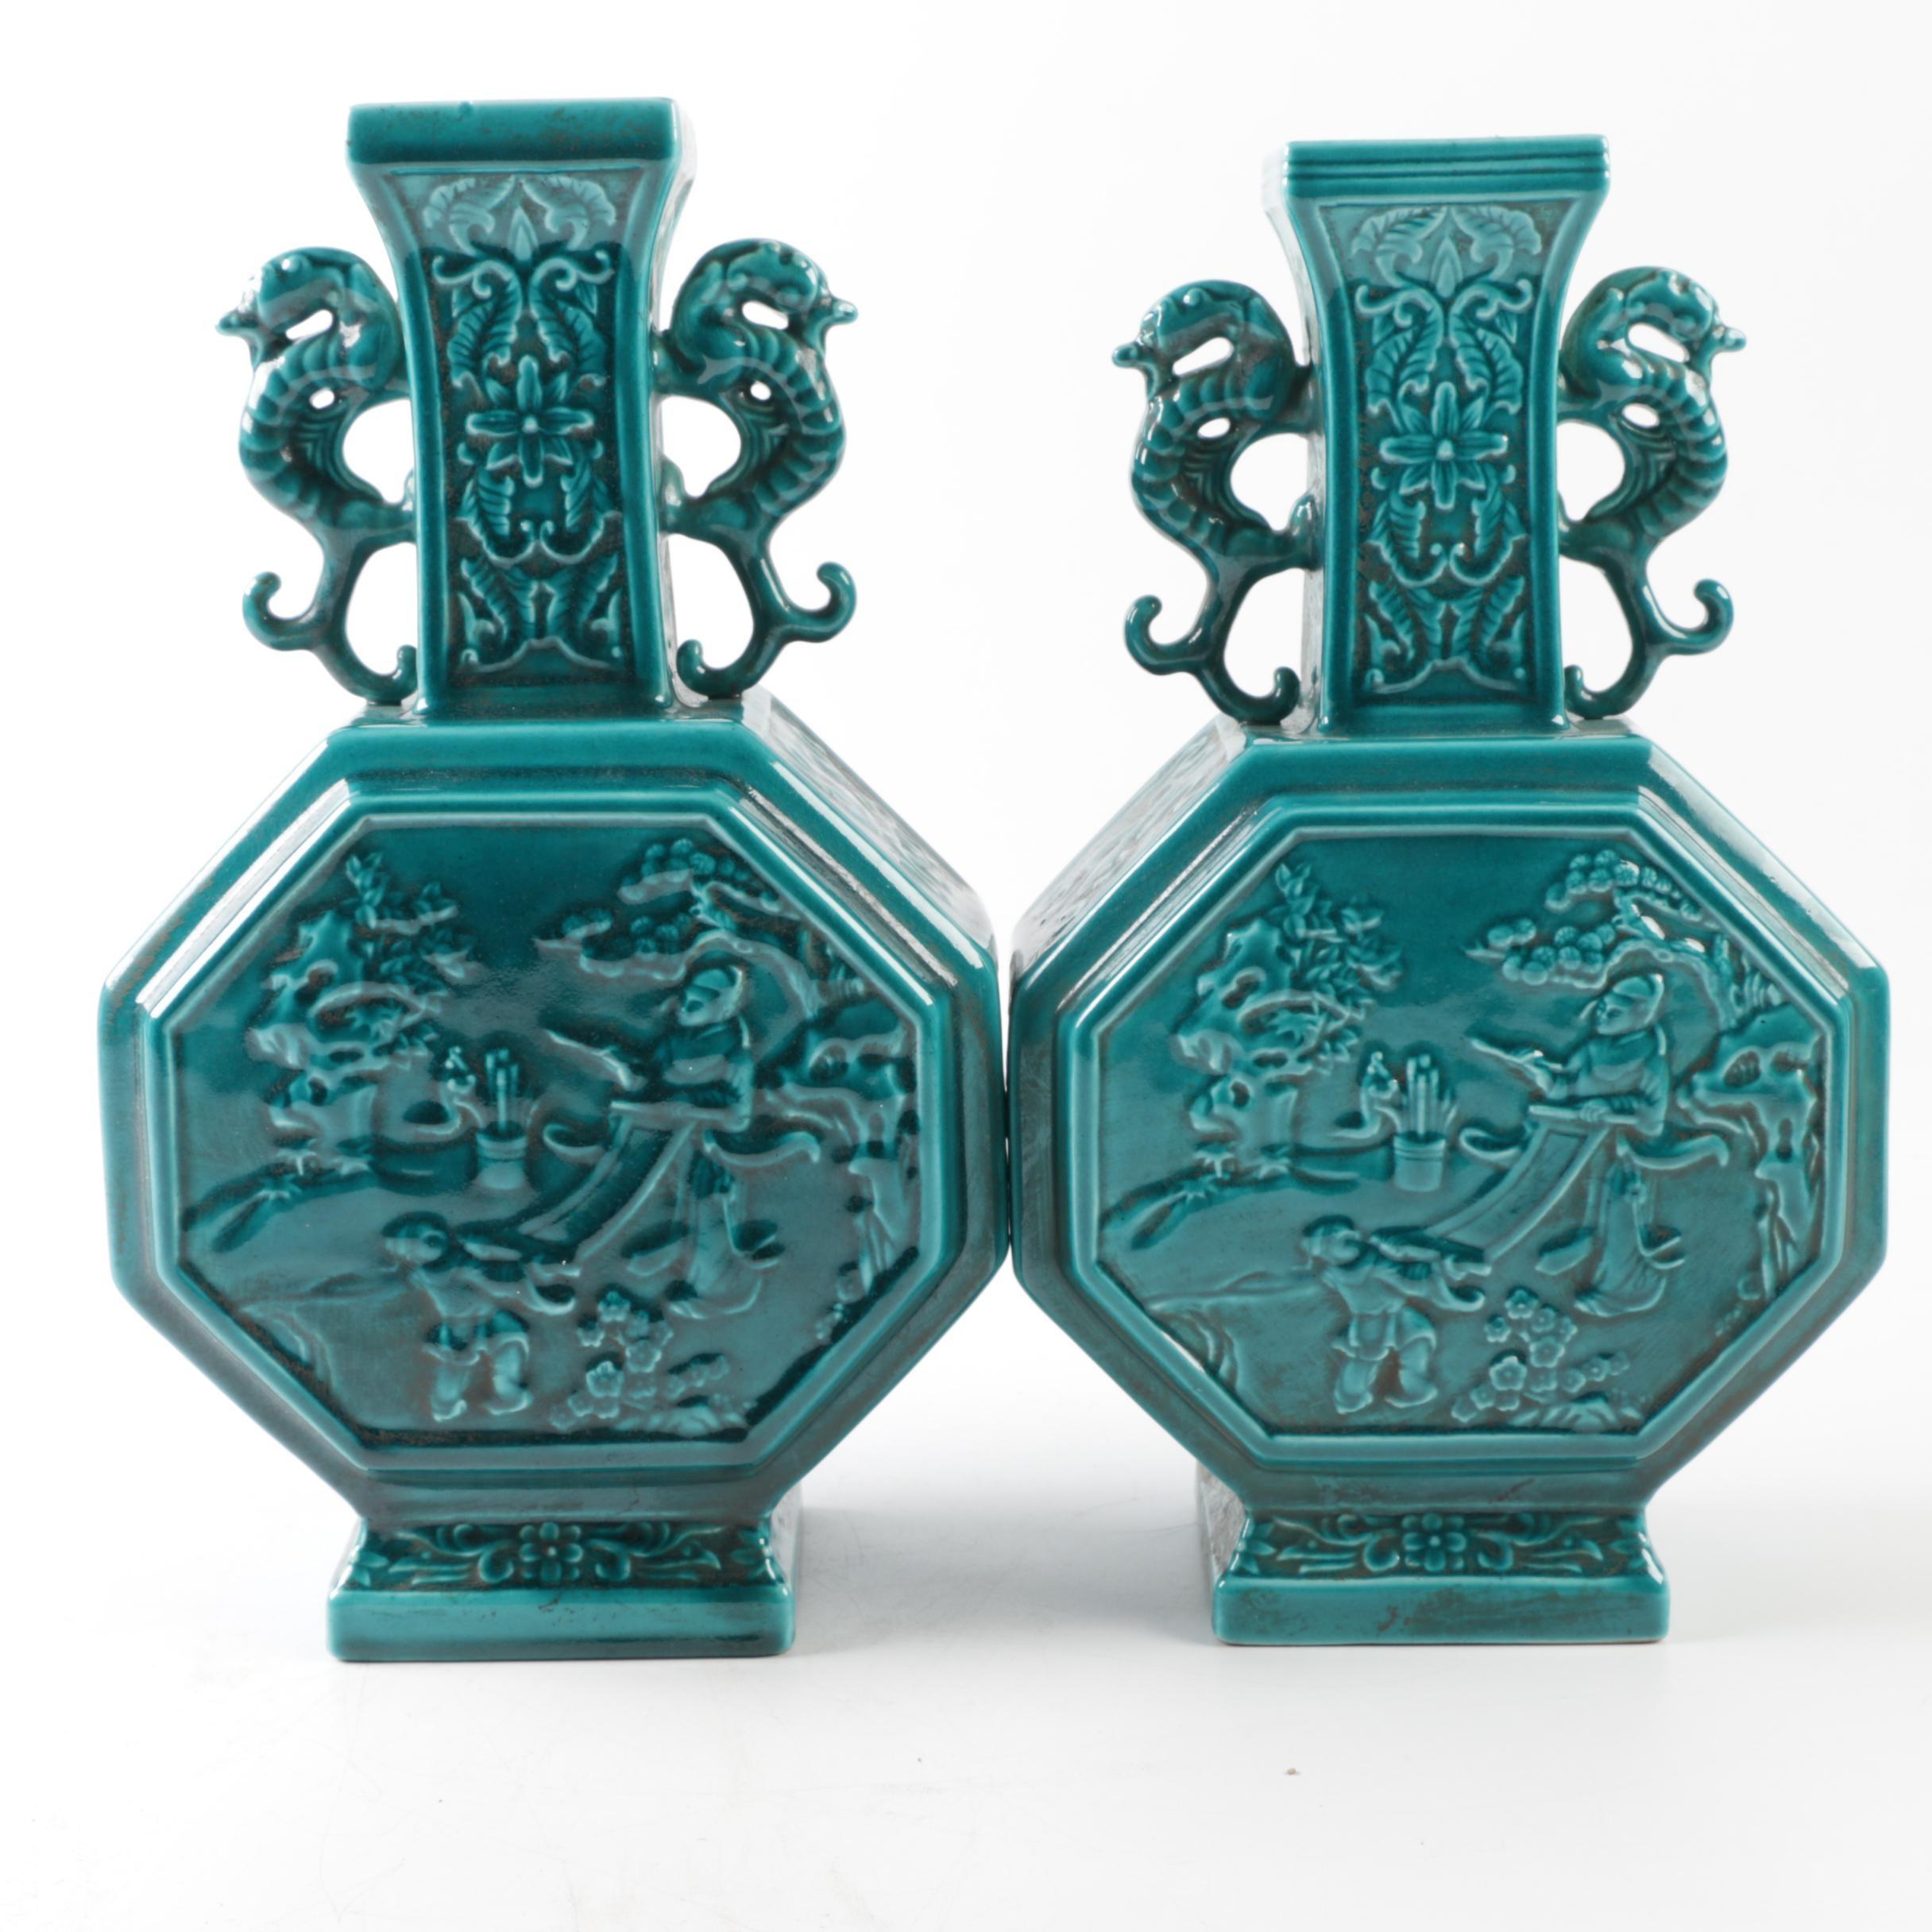 Pair of Ceramic Chinese Vases